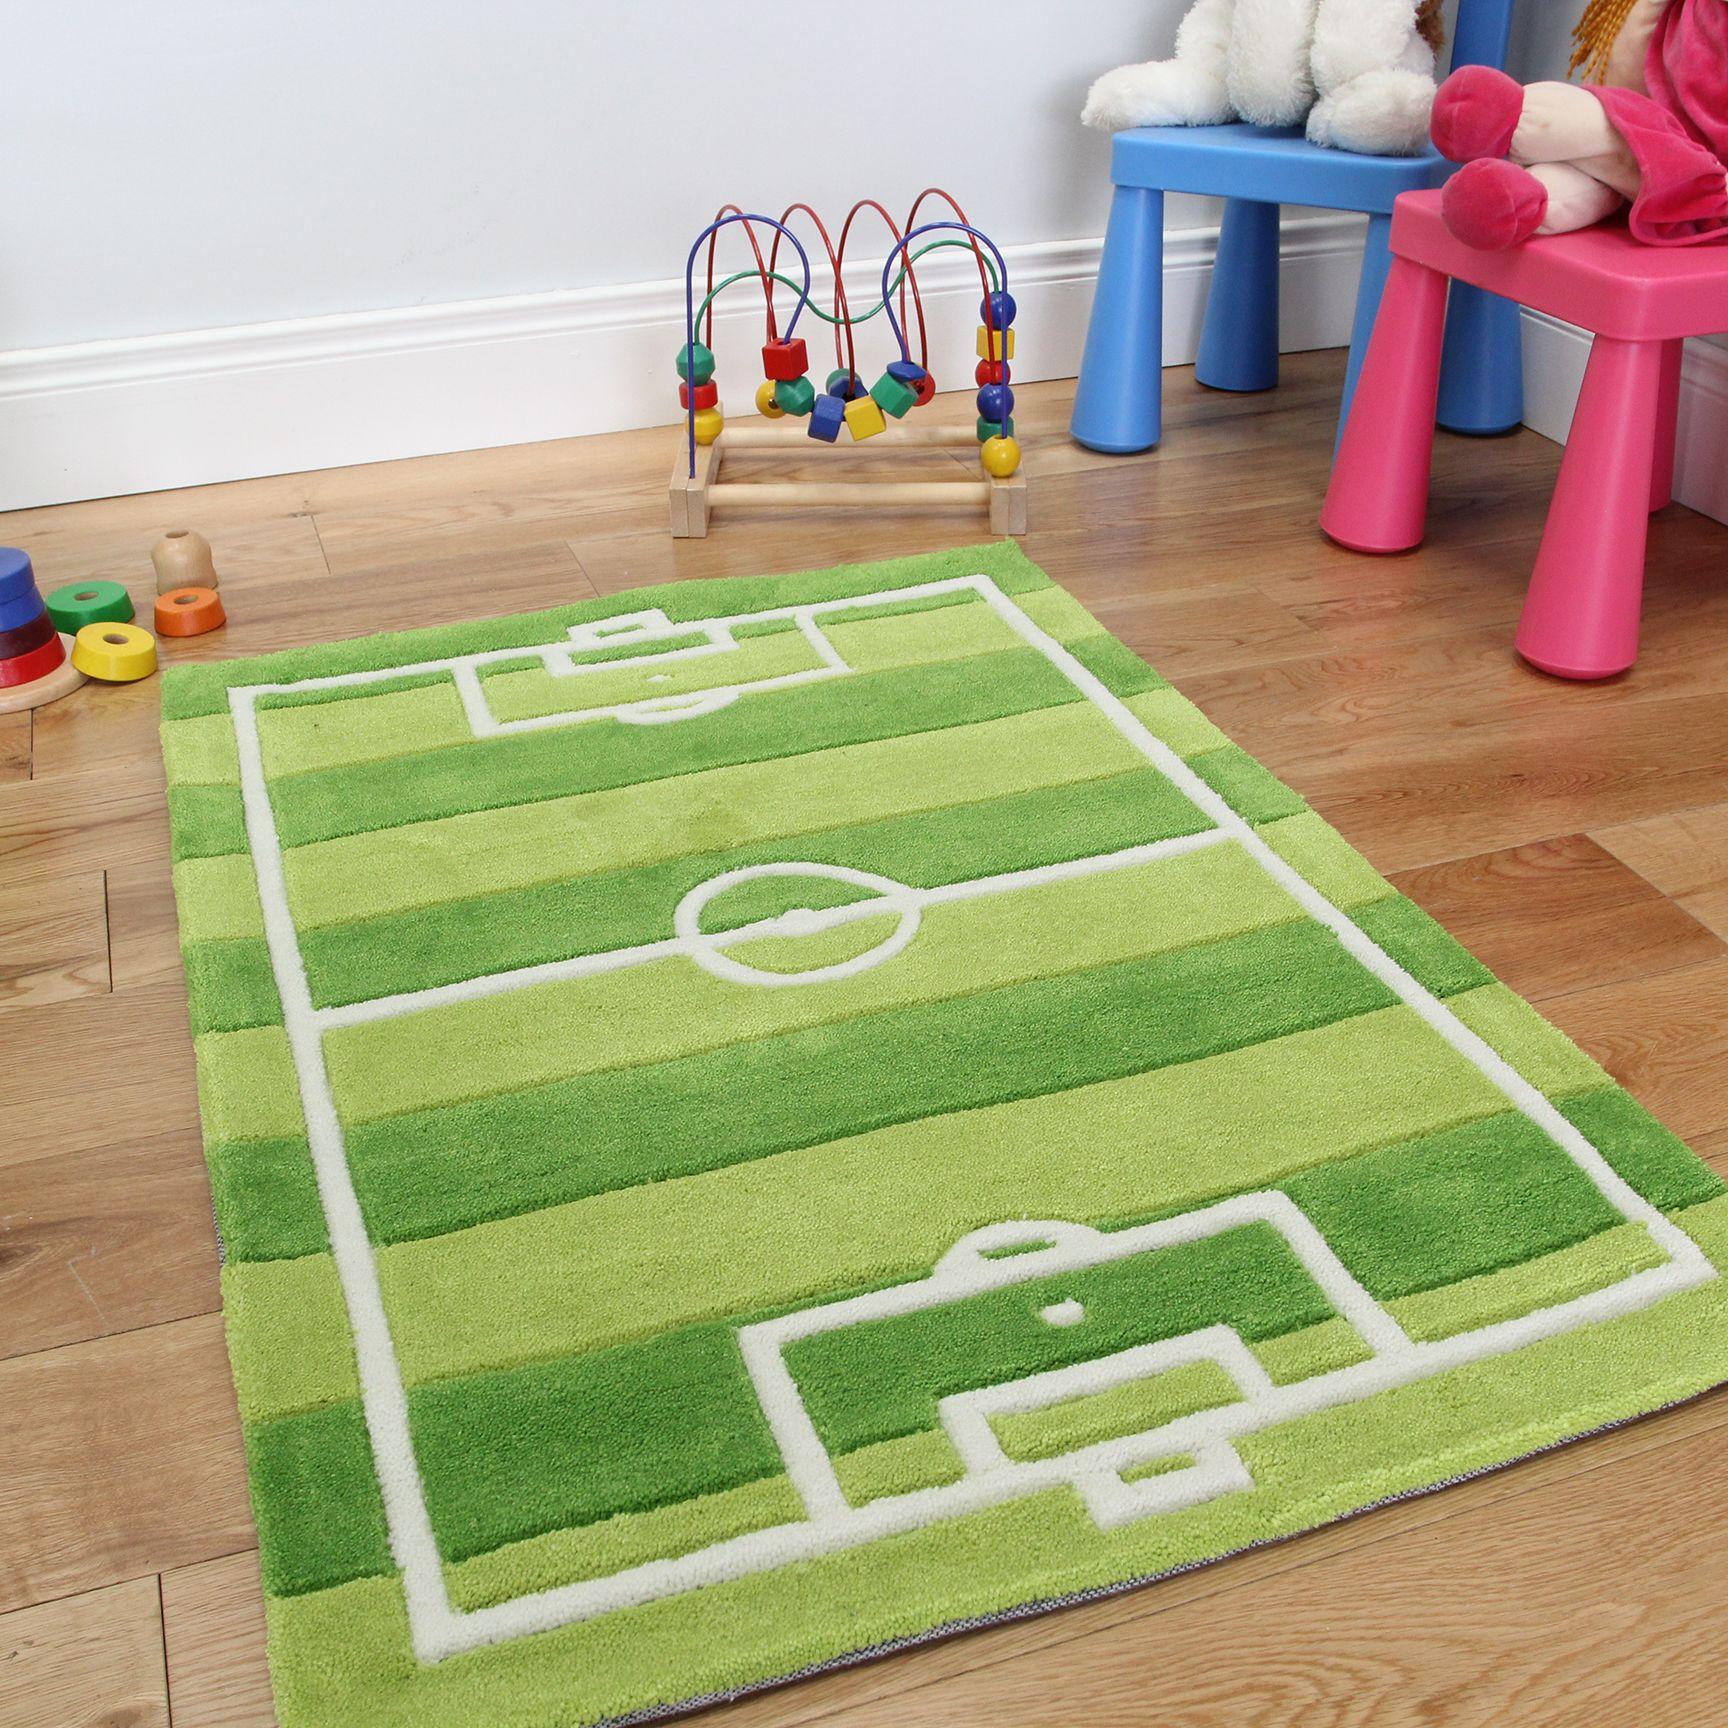 Cool Football Pitch Rug For Little Football Fanatics